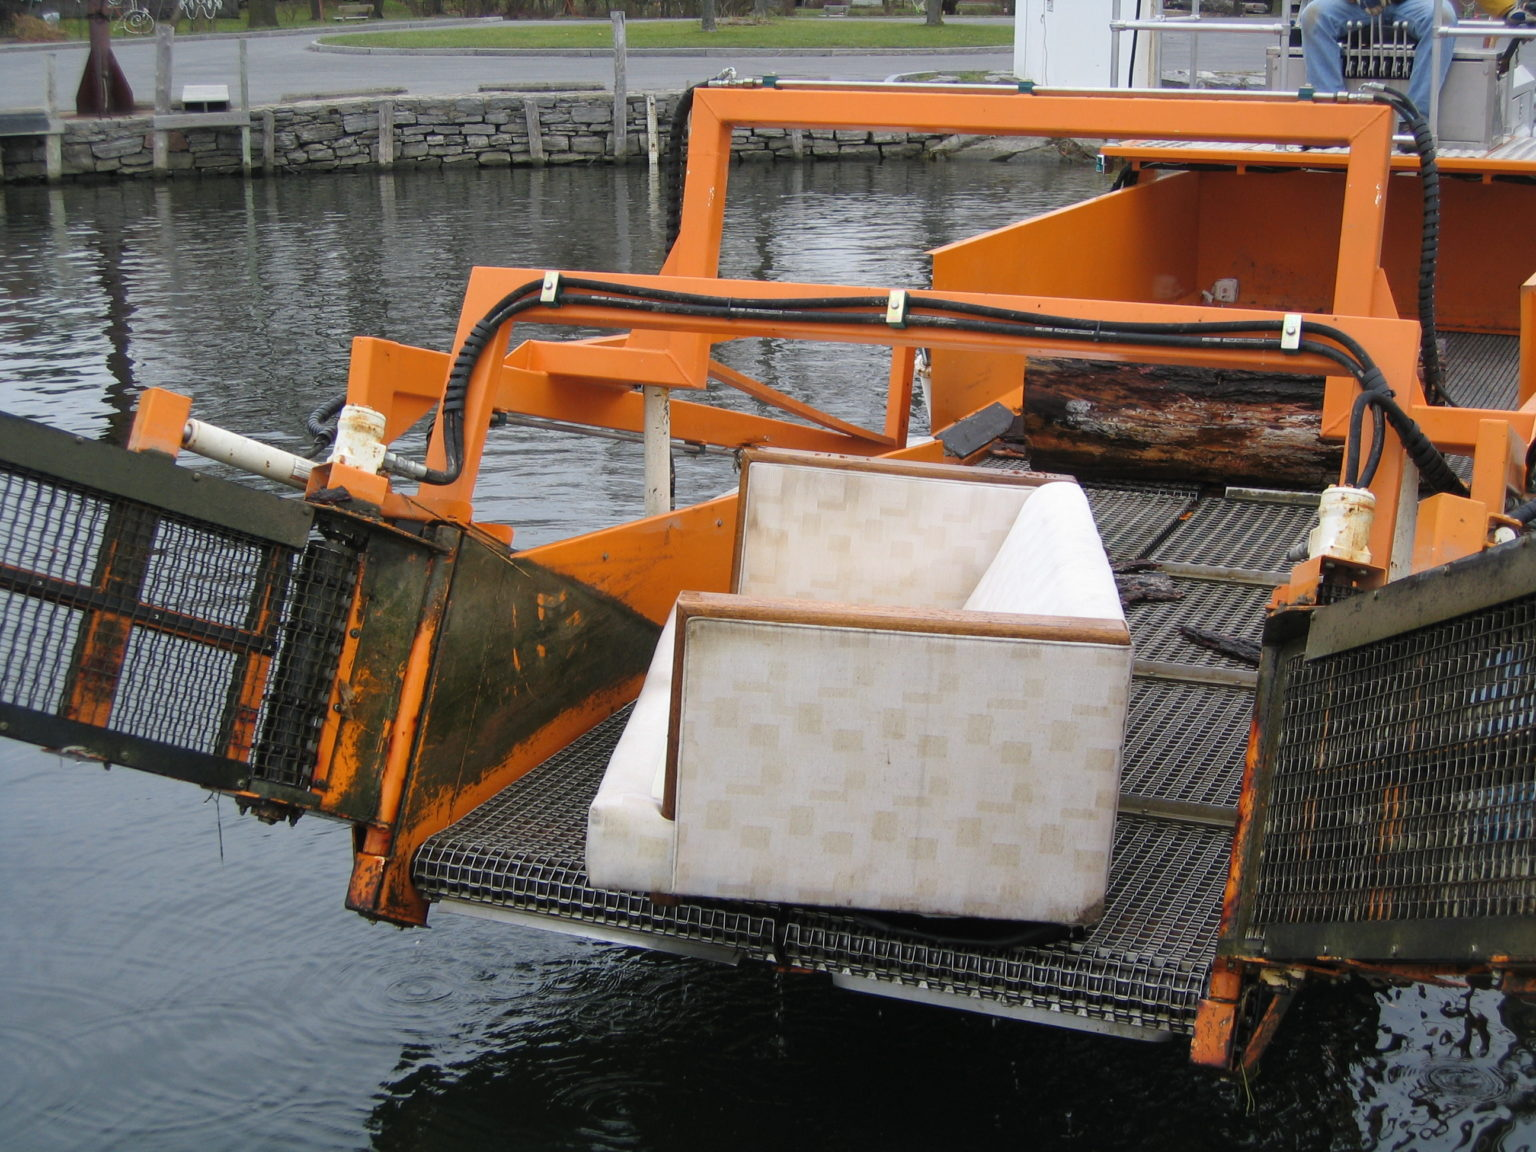 MC 202 picking up floating larger debris